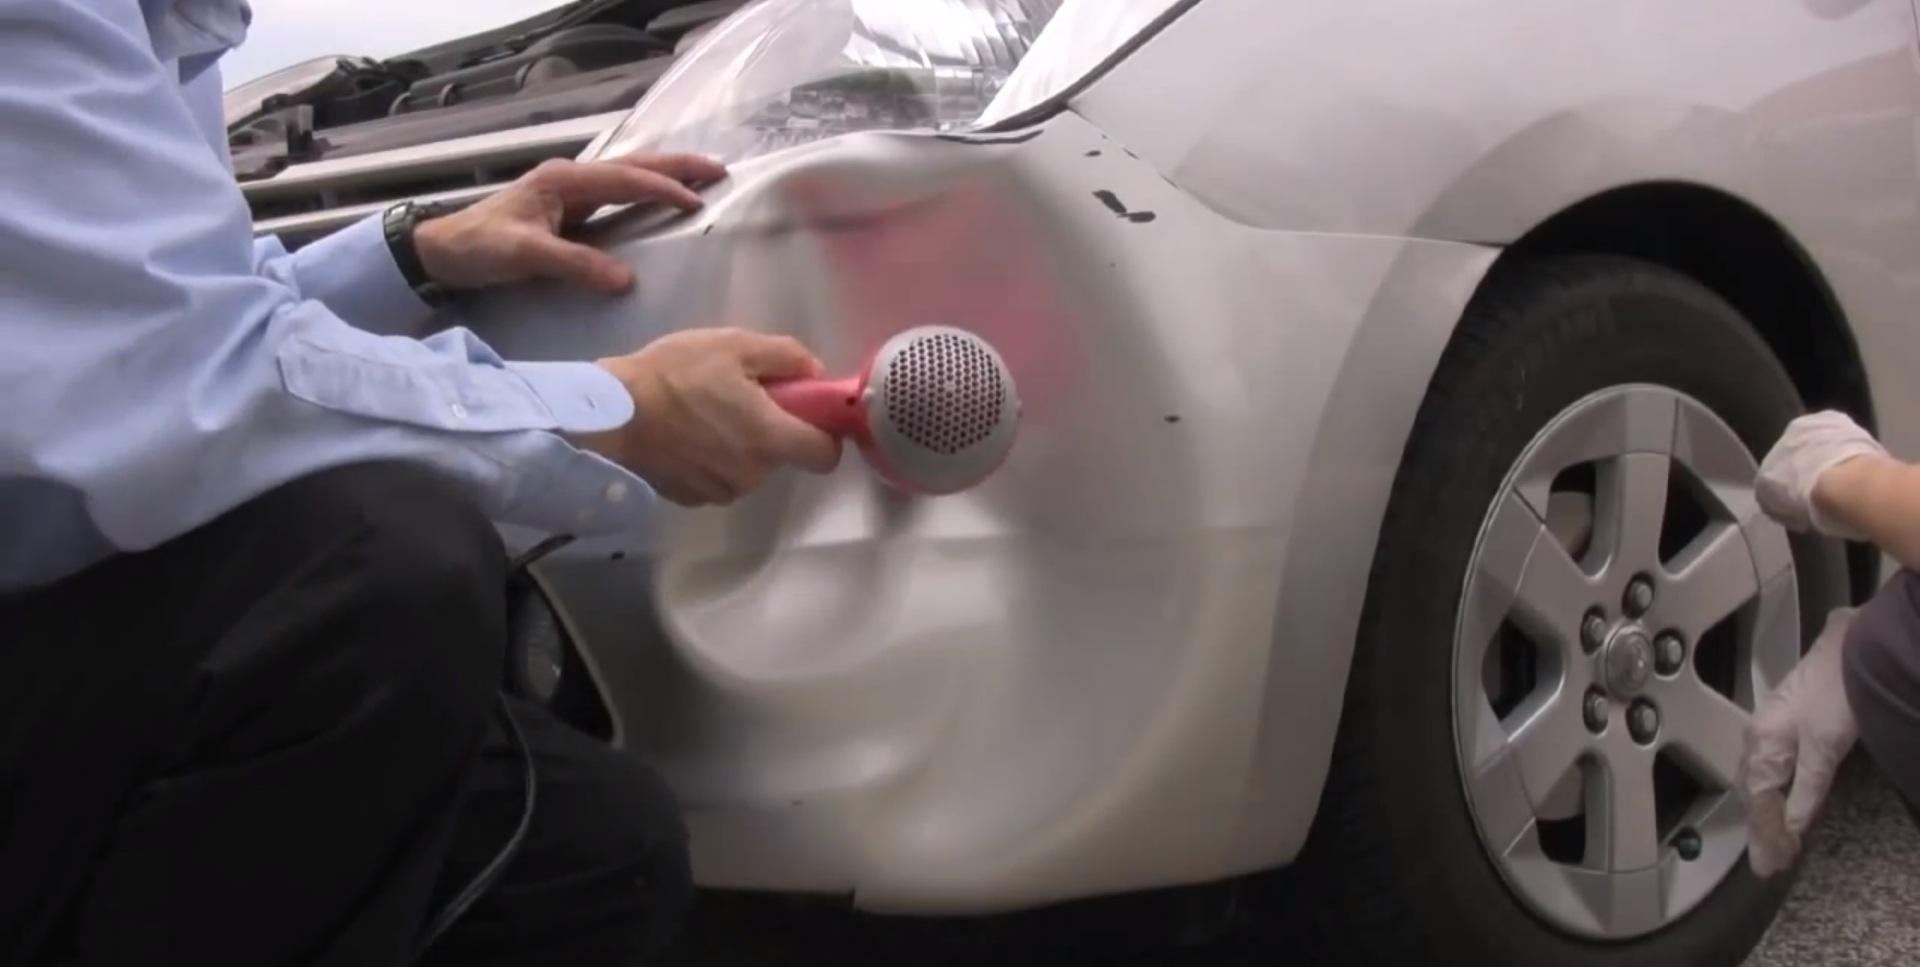 prius bumper repair  DIY: Toyota Prius Bumper Dent Fix with a Hair Dryer - autoevolution